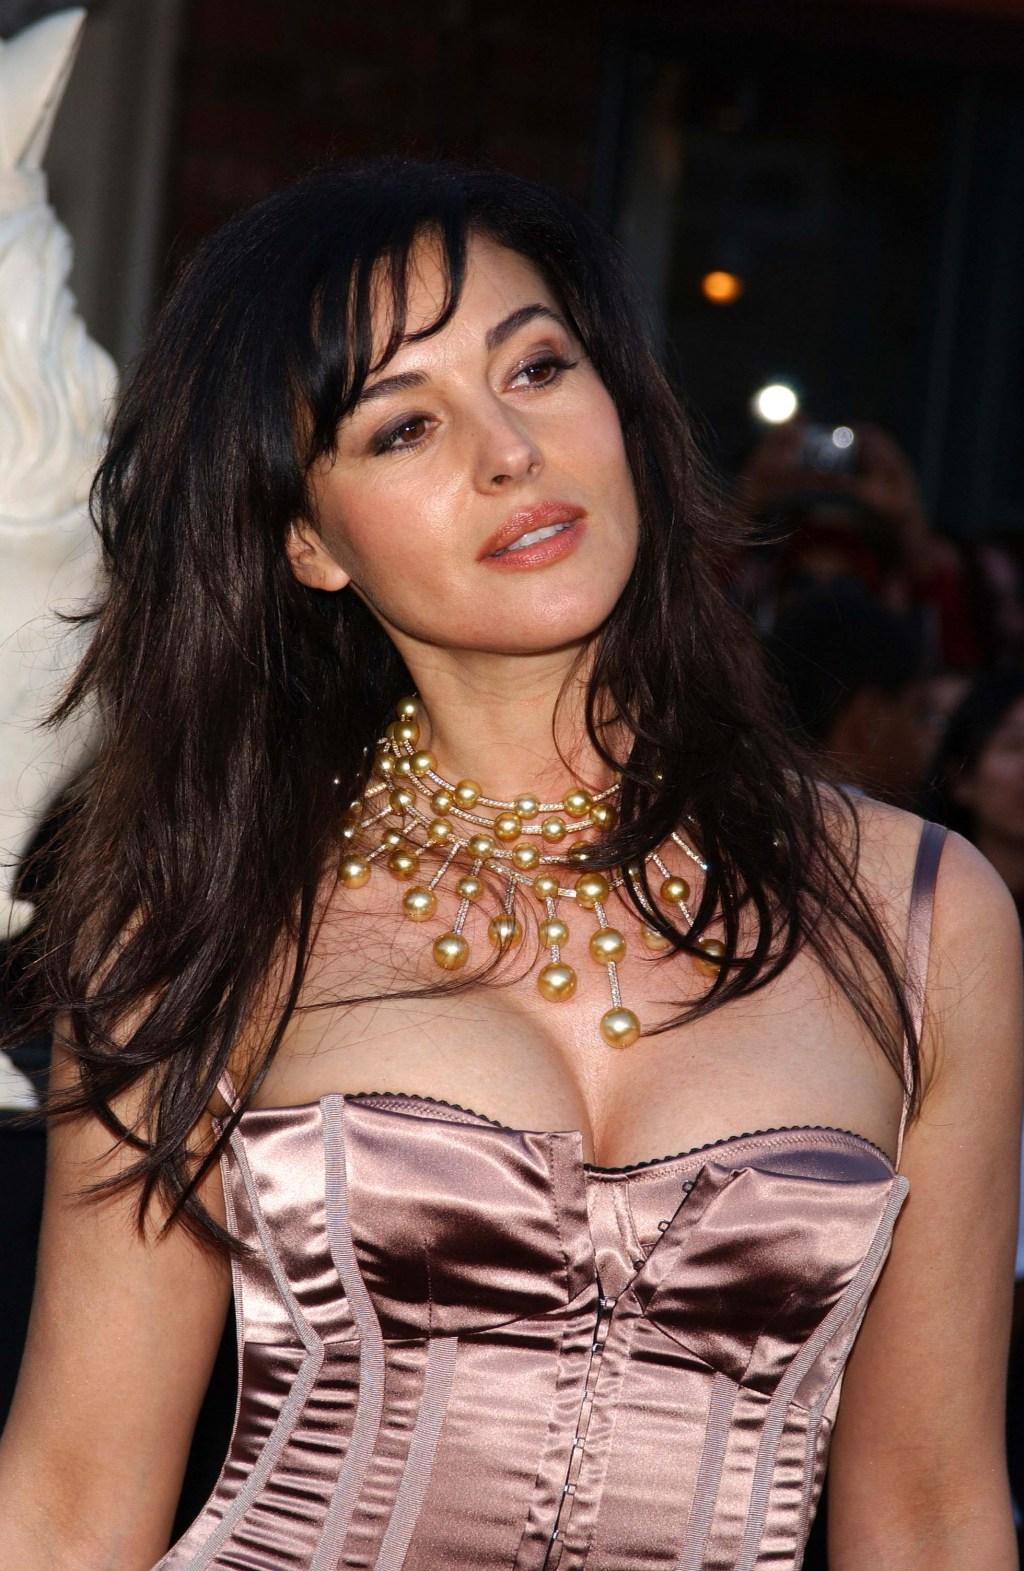 hair extention monica bellucci hot celebrity